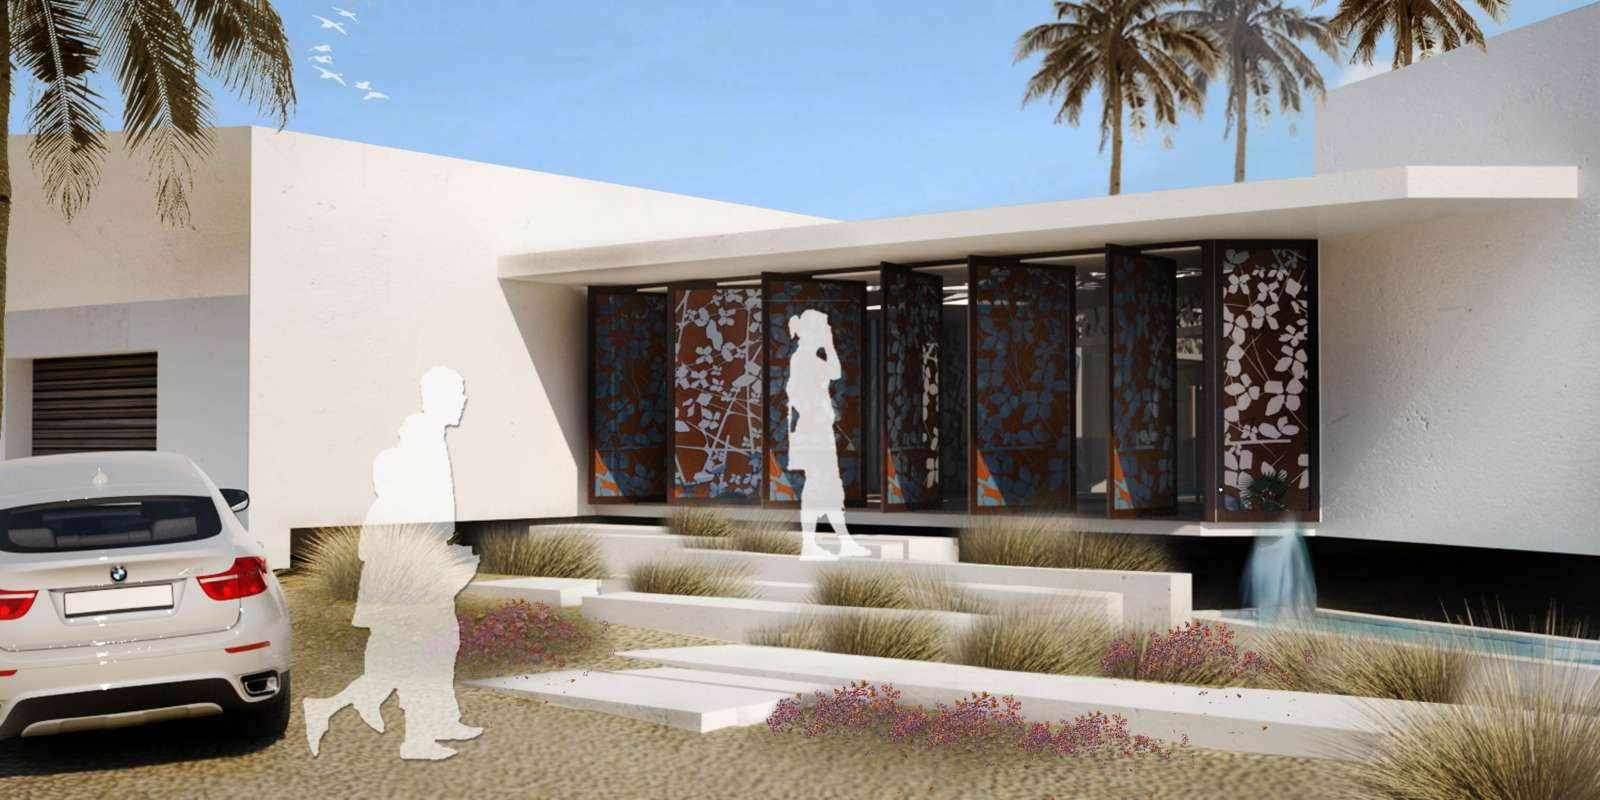 05-Alkhozama-Desert-Casa-de-Ark-Kassam-Arquitectos